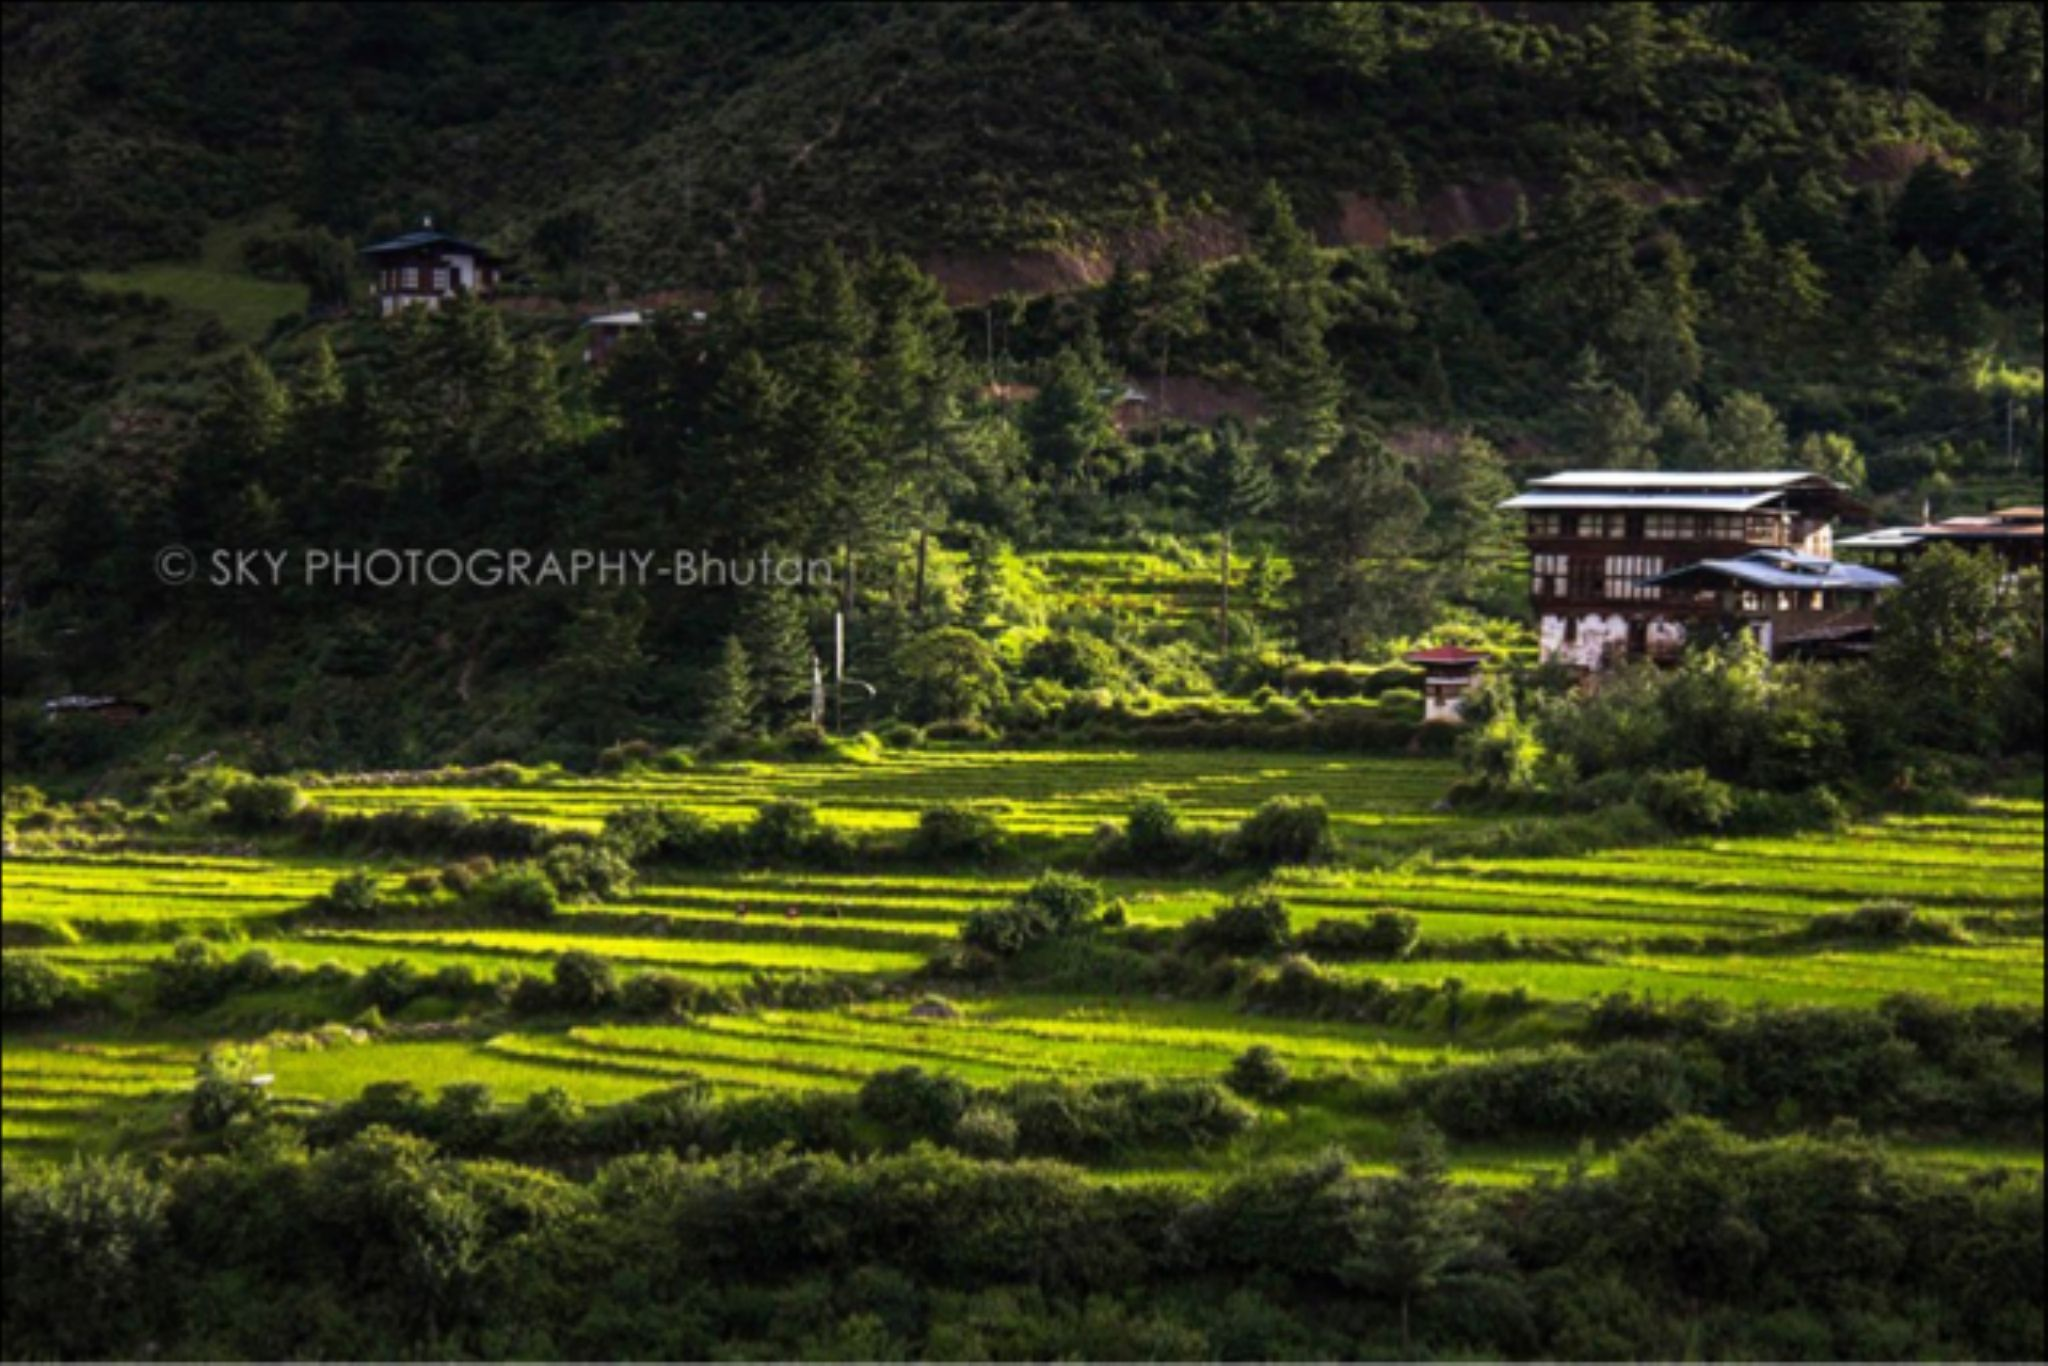 IMG_4118 by Kencho Wangdi